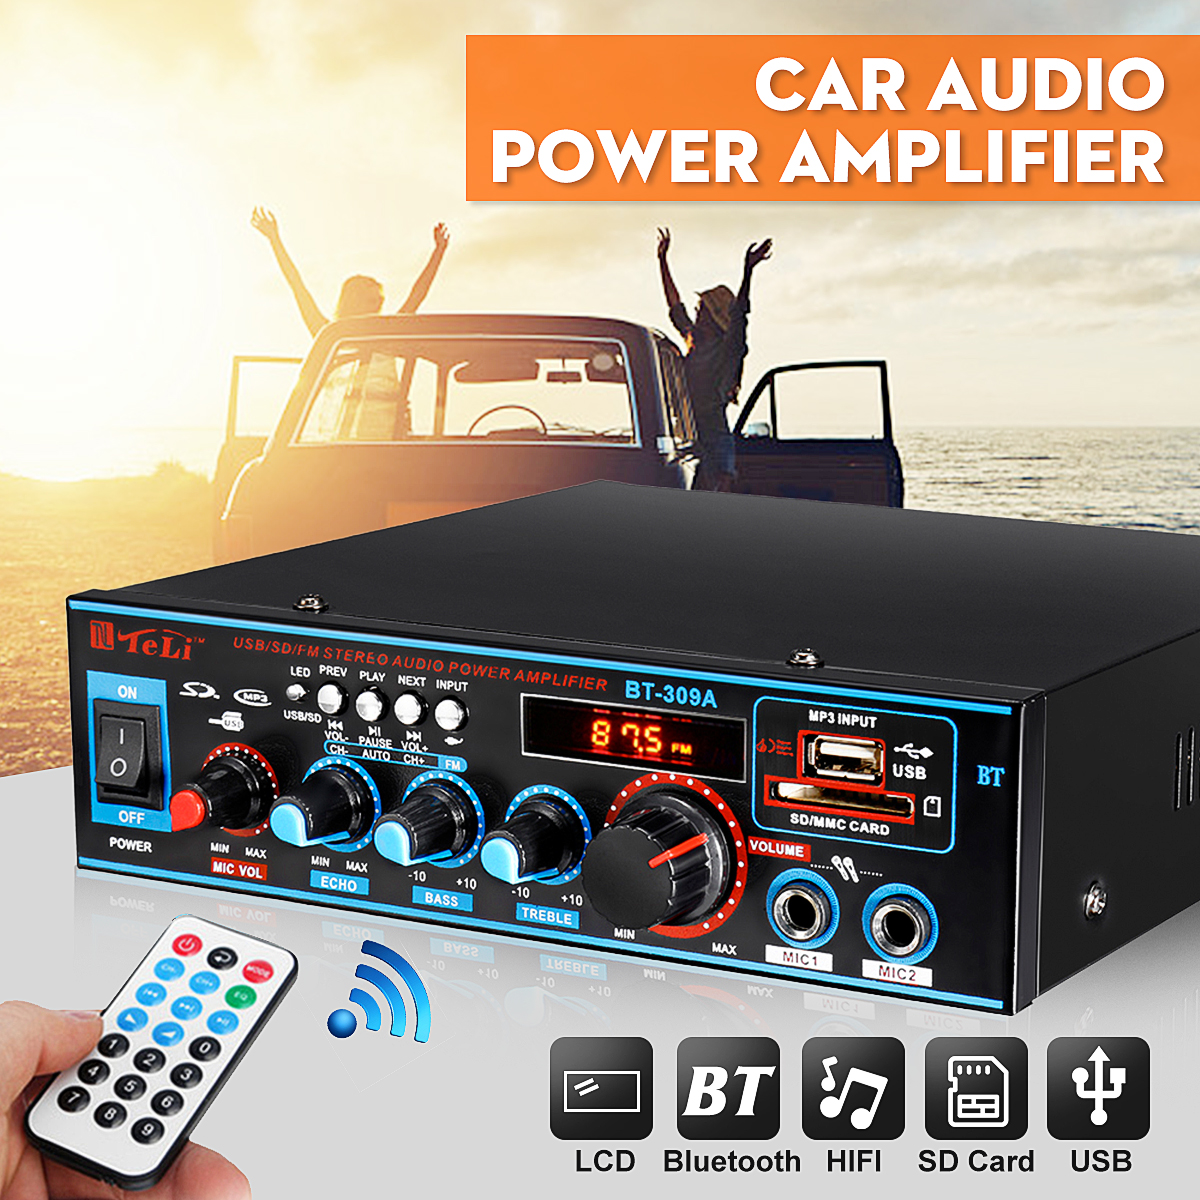 220V 12V 800W Car Audio Stereo Power Amplifier Bluetooth USB FM Radio H